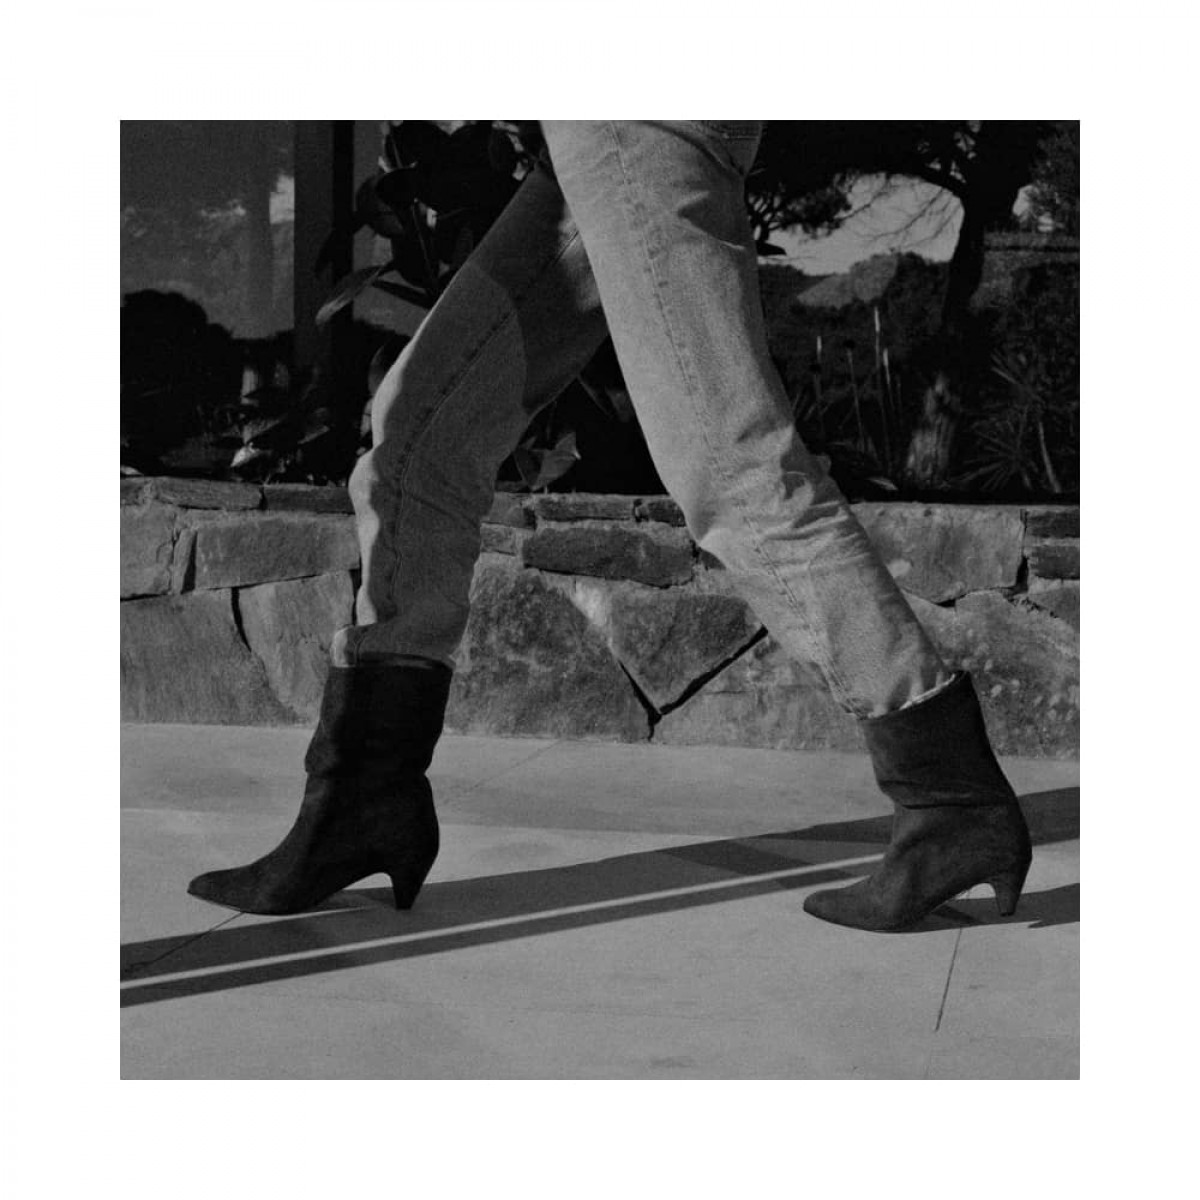 vully 50 Stiletto - Suede Black - model billede